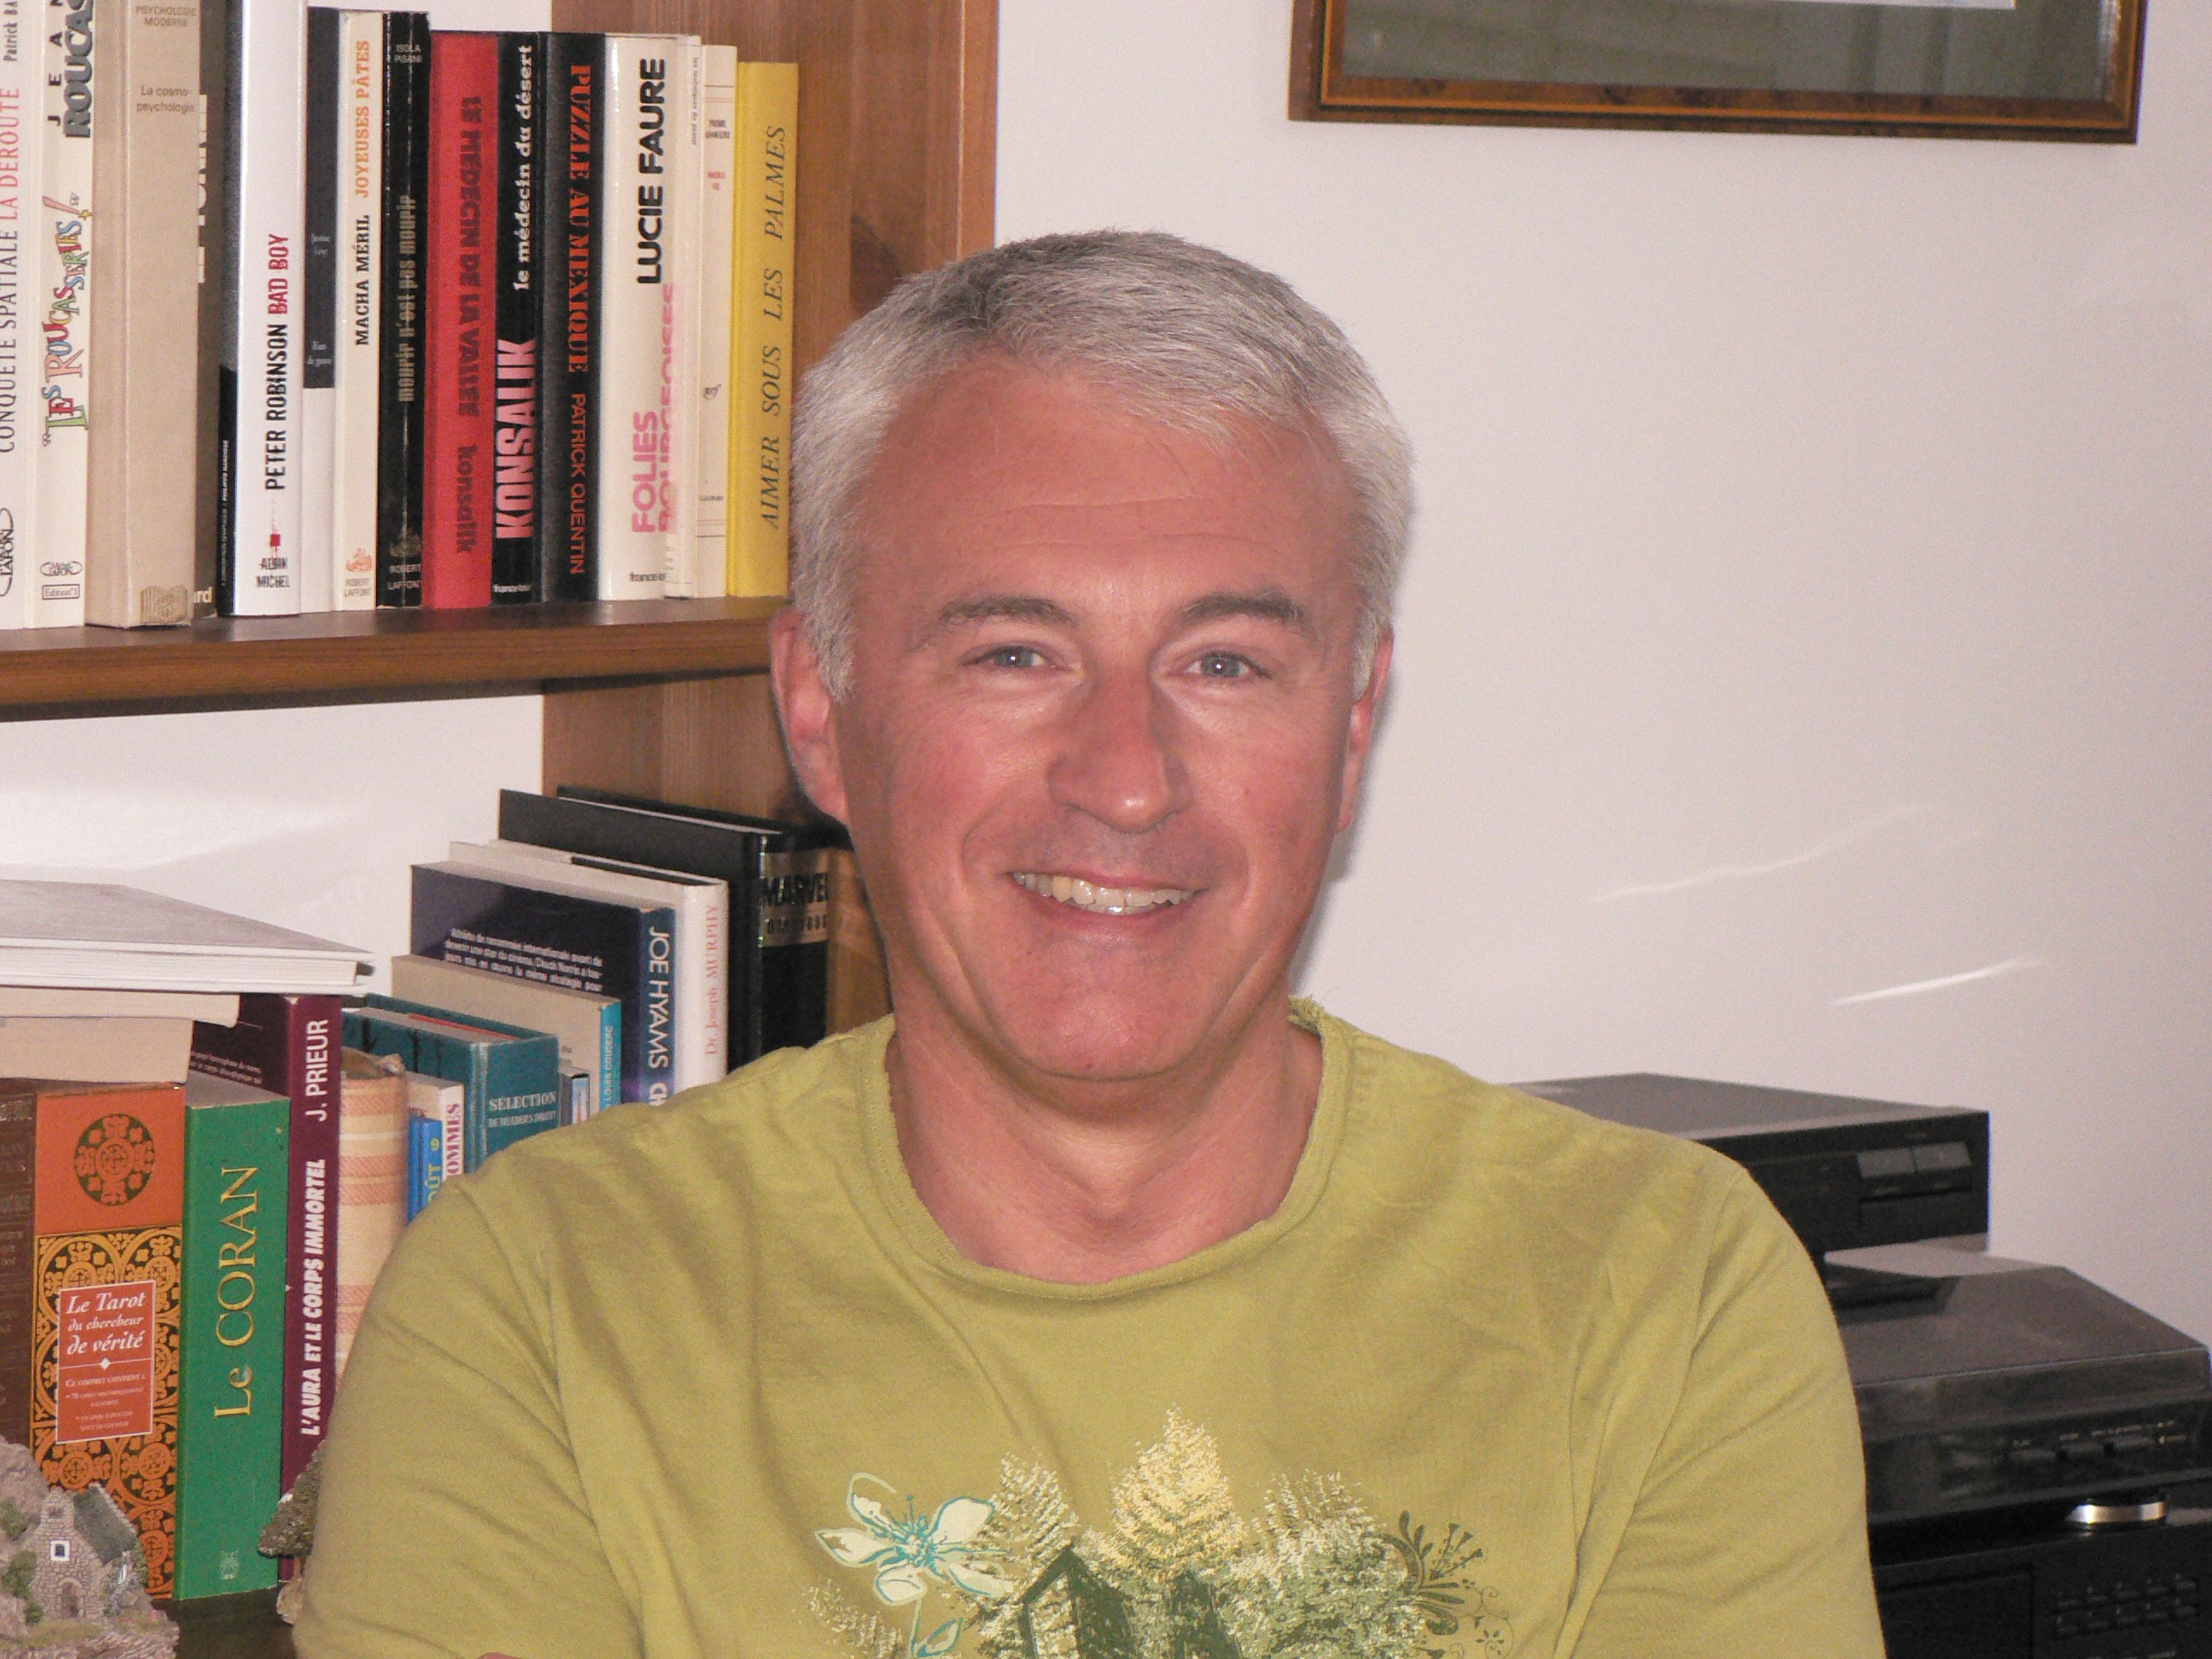 Olivier Cape